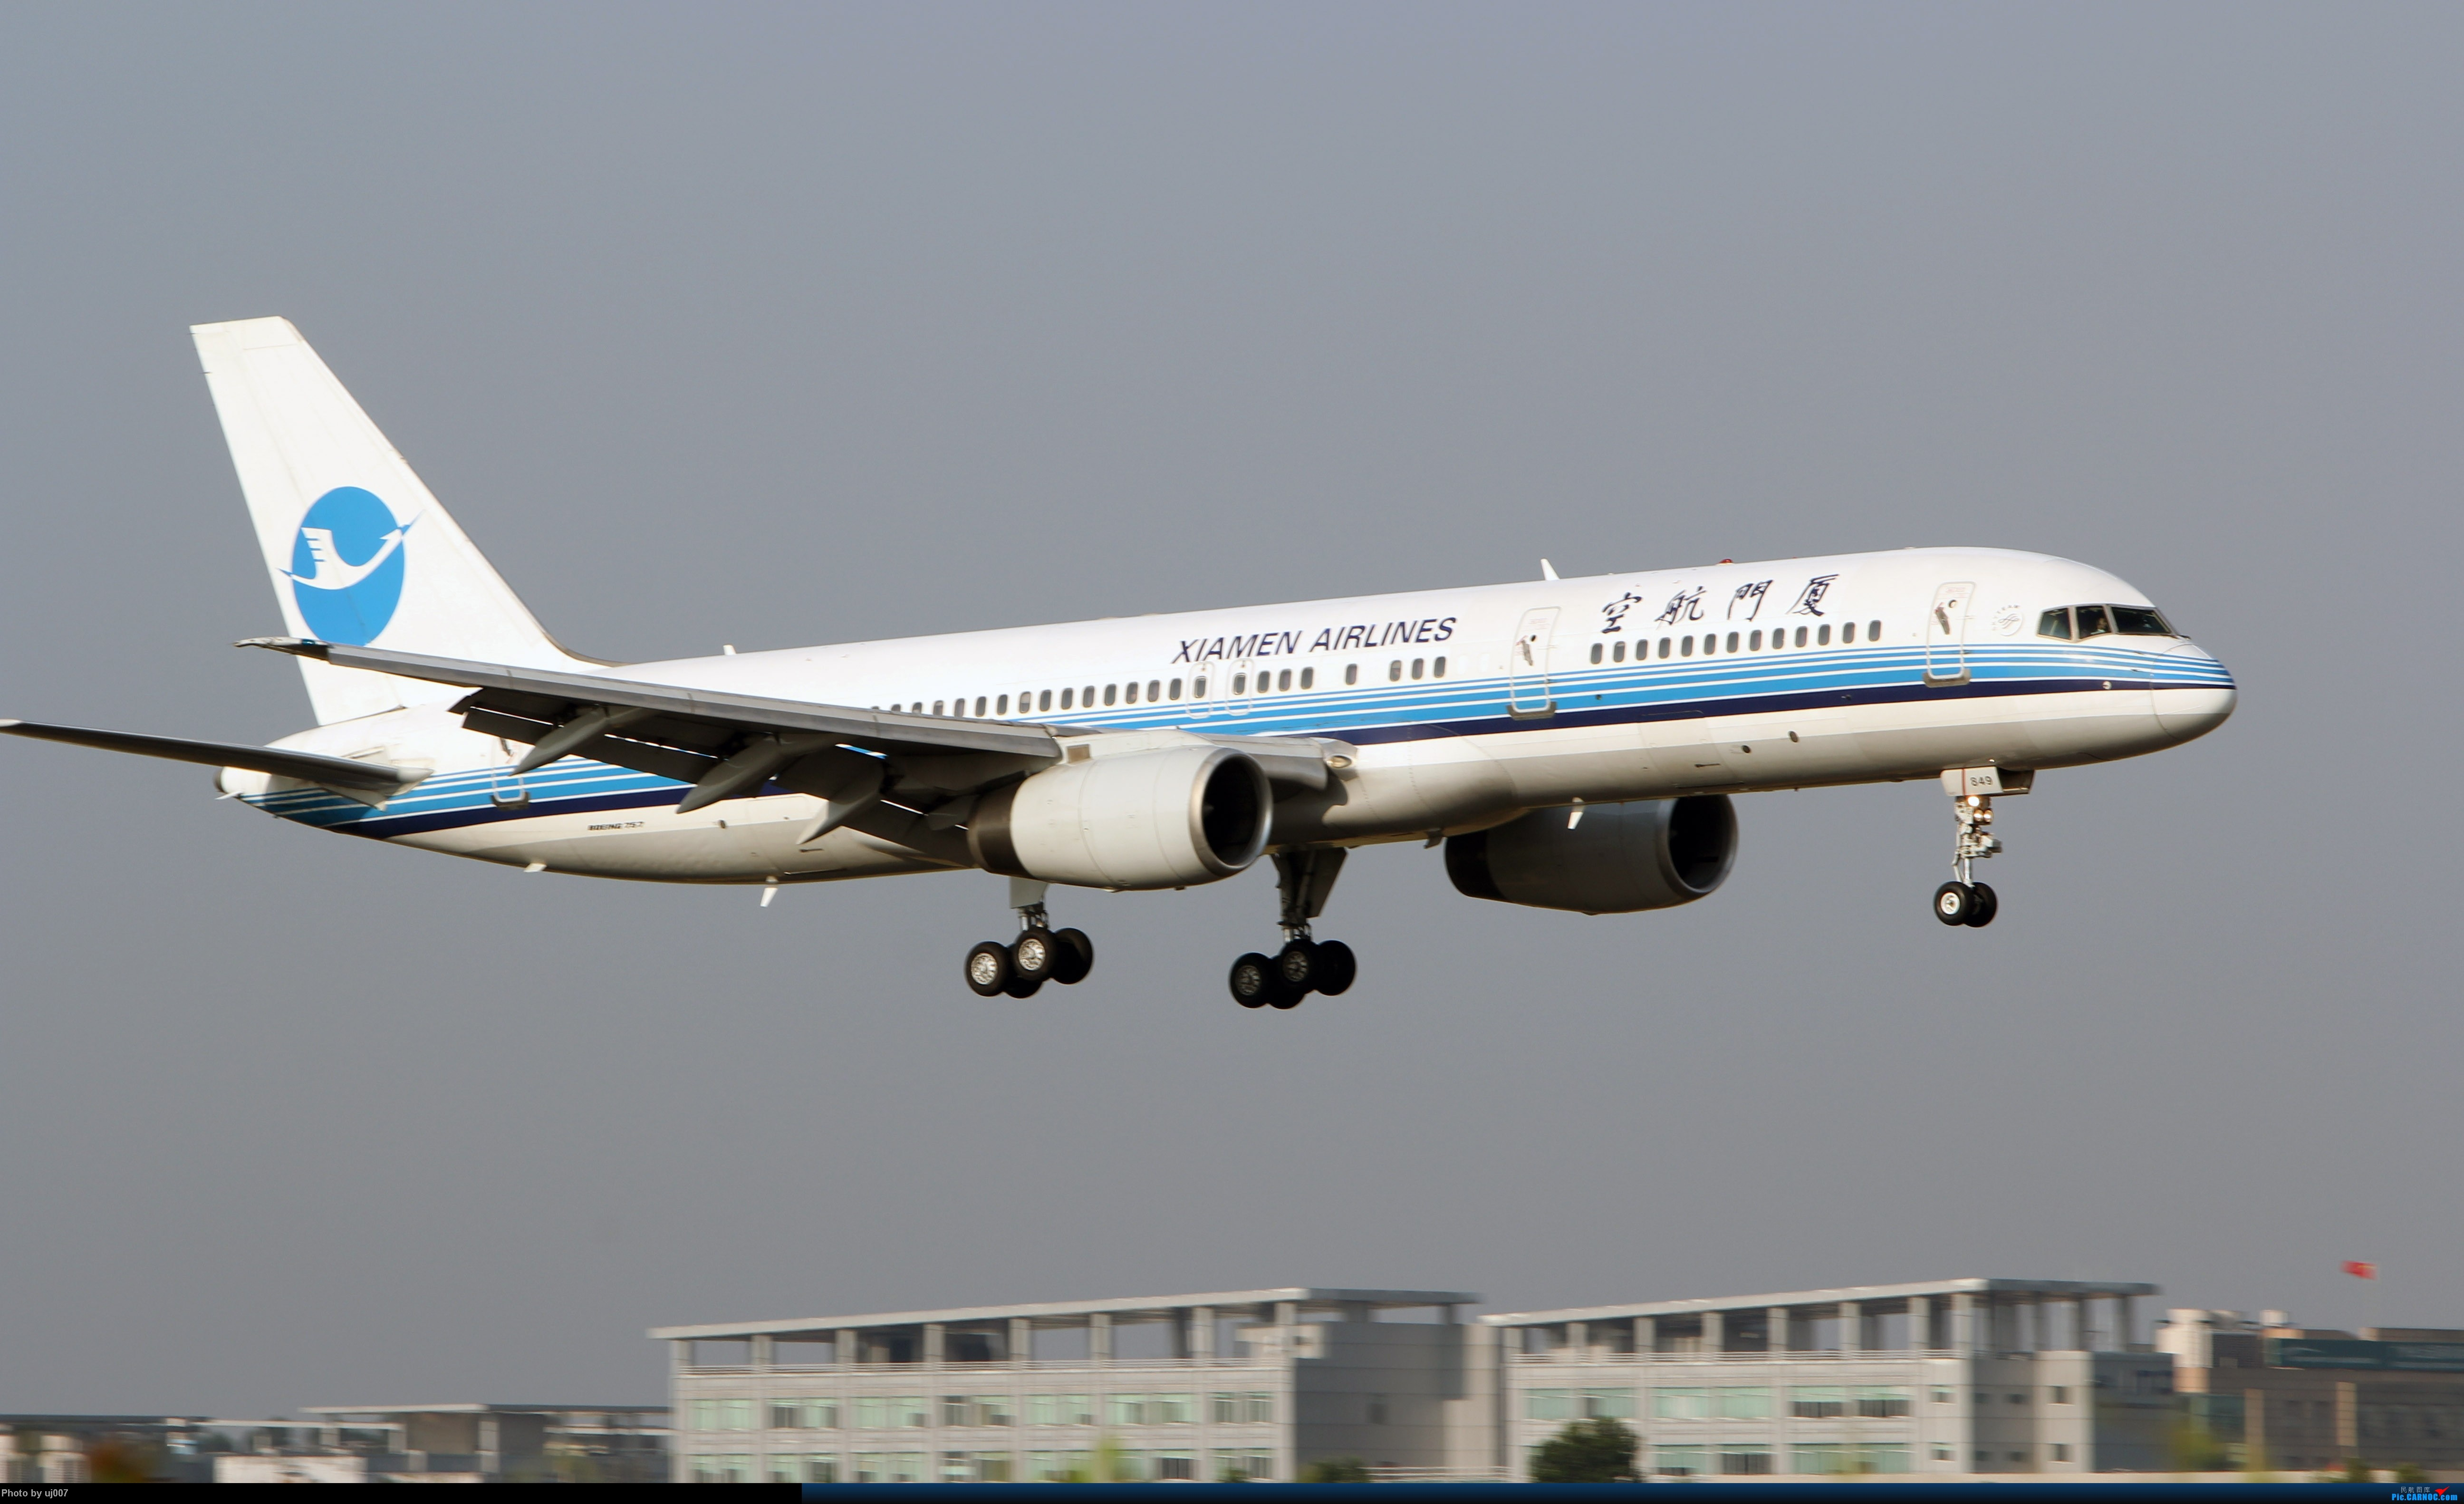 Re:[原创]10月2日白云拍机(大飞机,特别妆,外航,闪灯,擦烟)求指点. BOEING 757-200 B-2849 广州白云国际机场